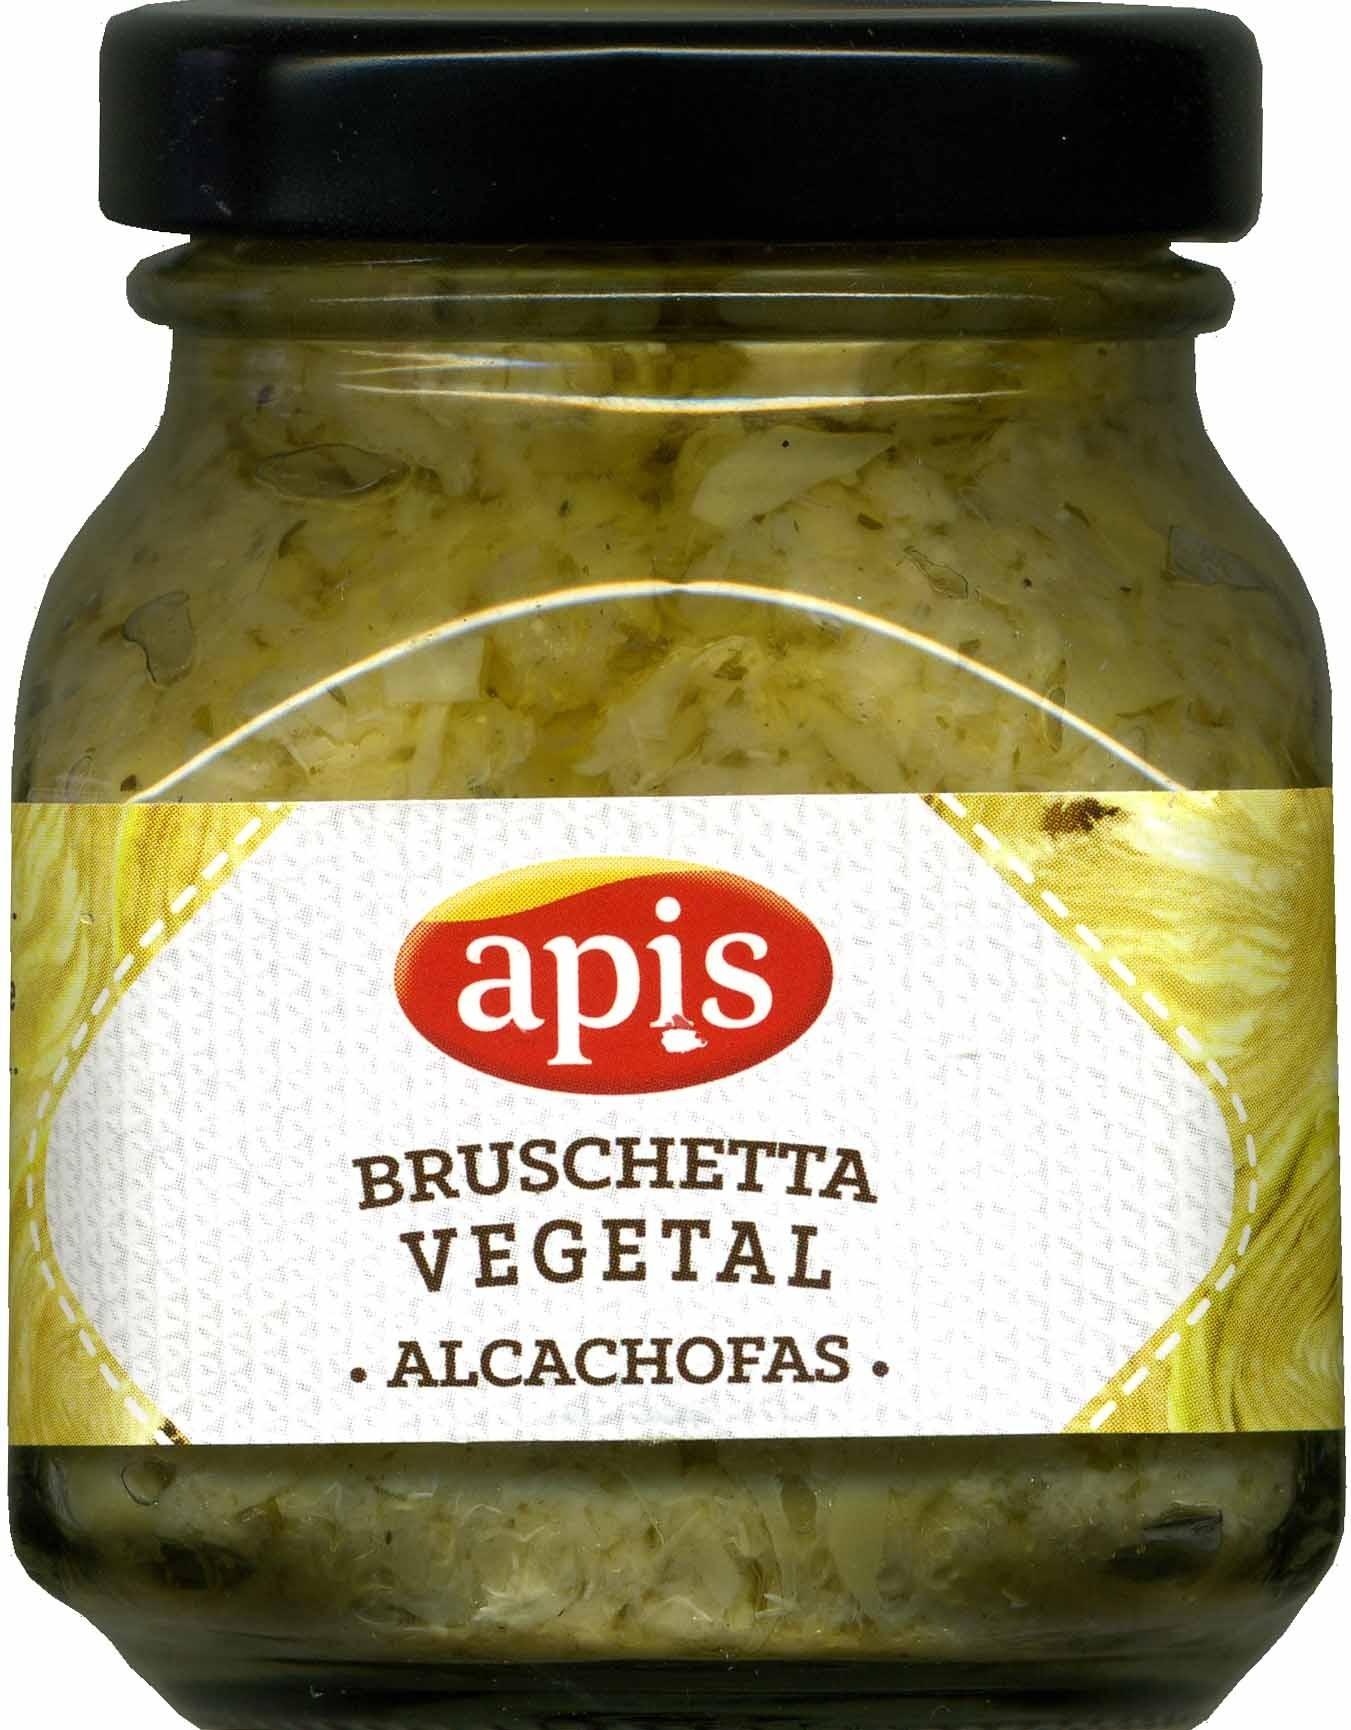 Bruschetta vegetal de alcachofas - Produit - es